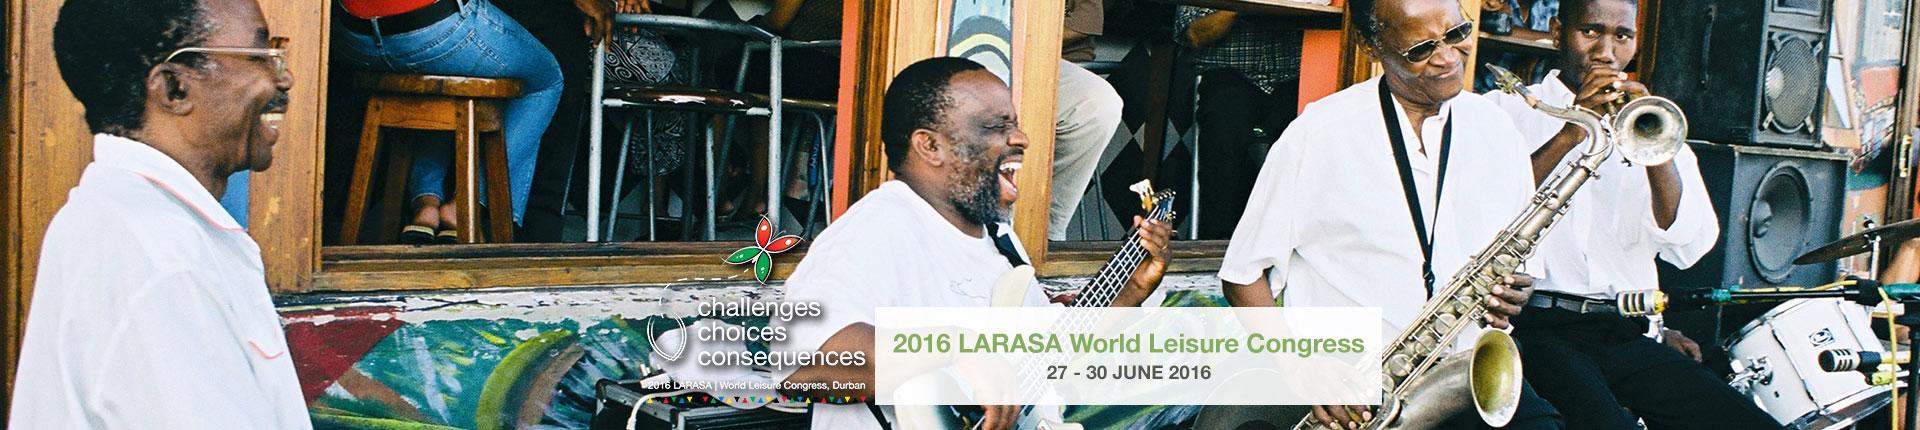 larasa-banners-2